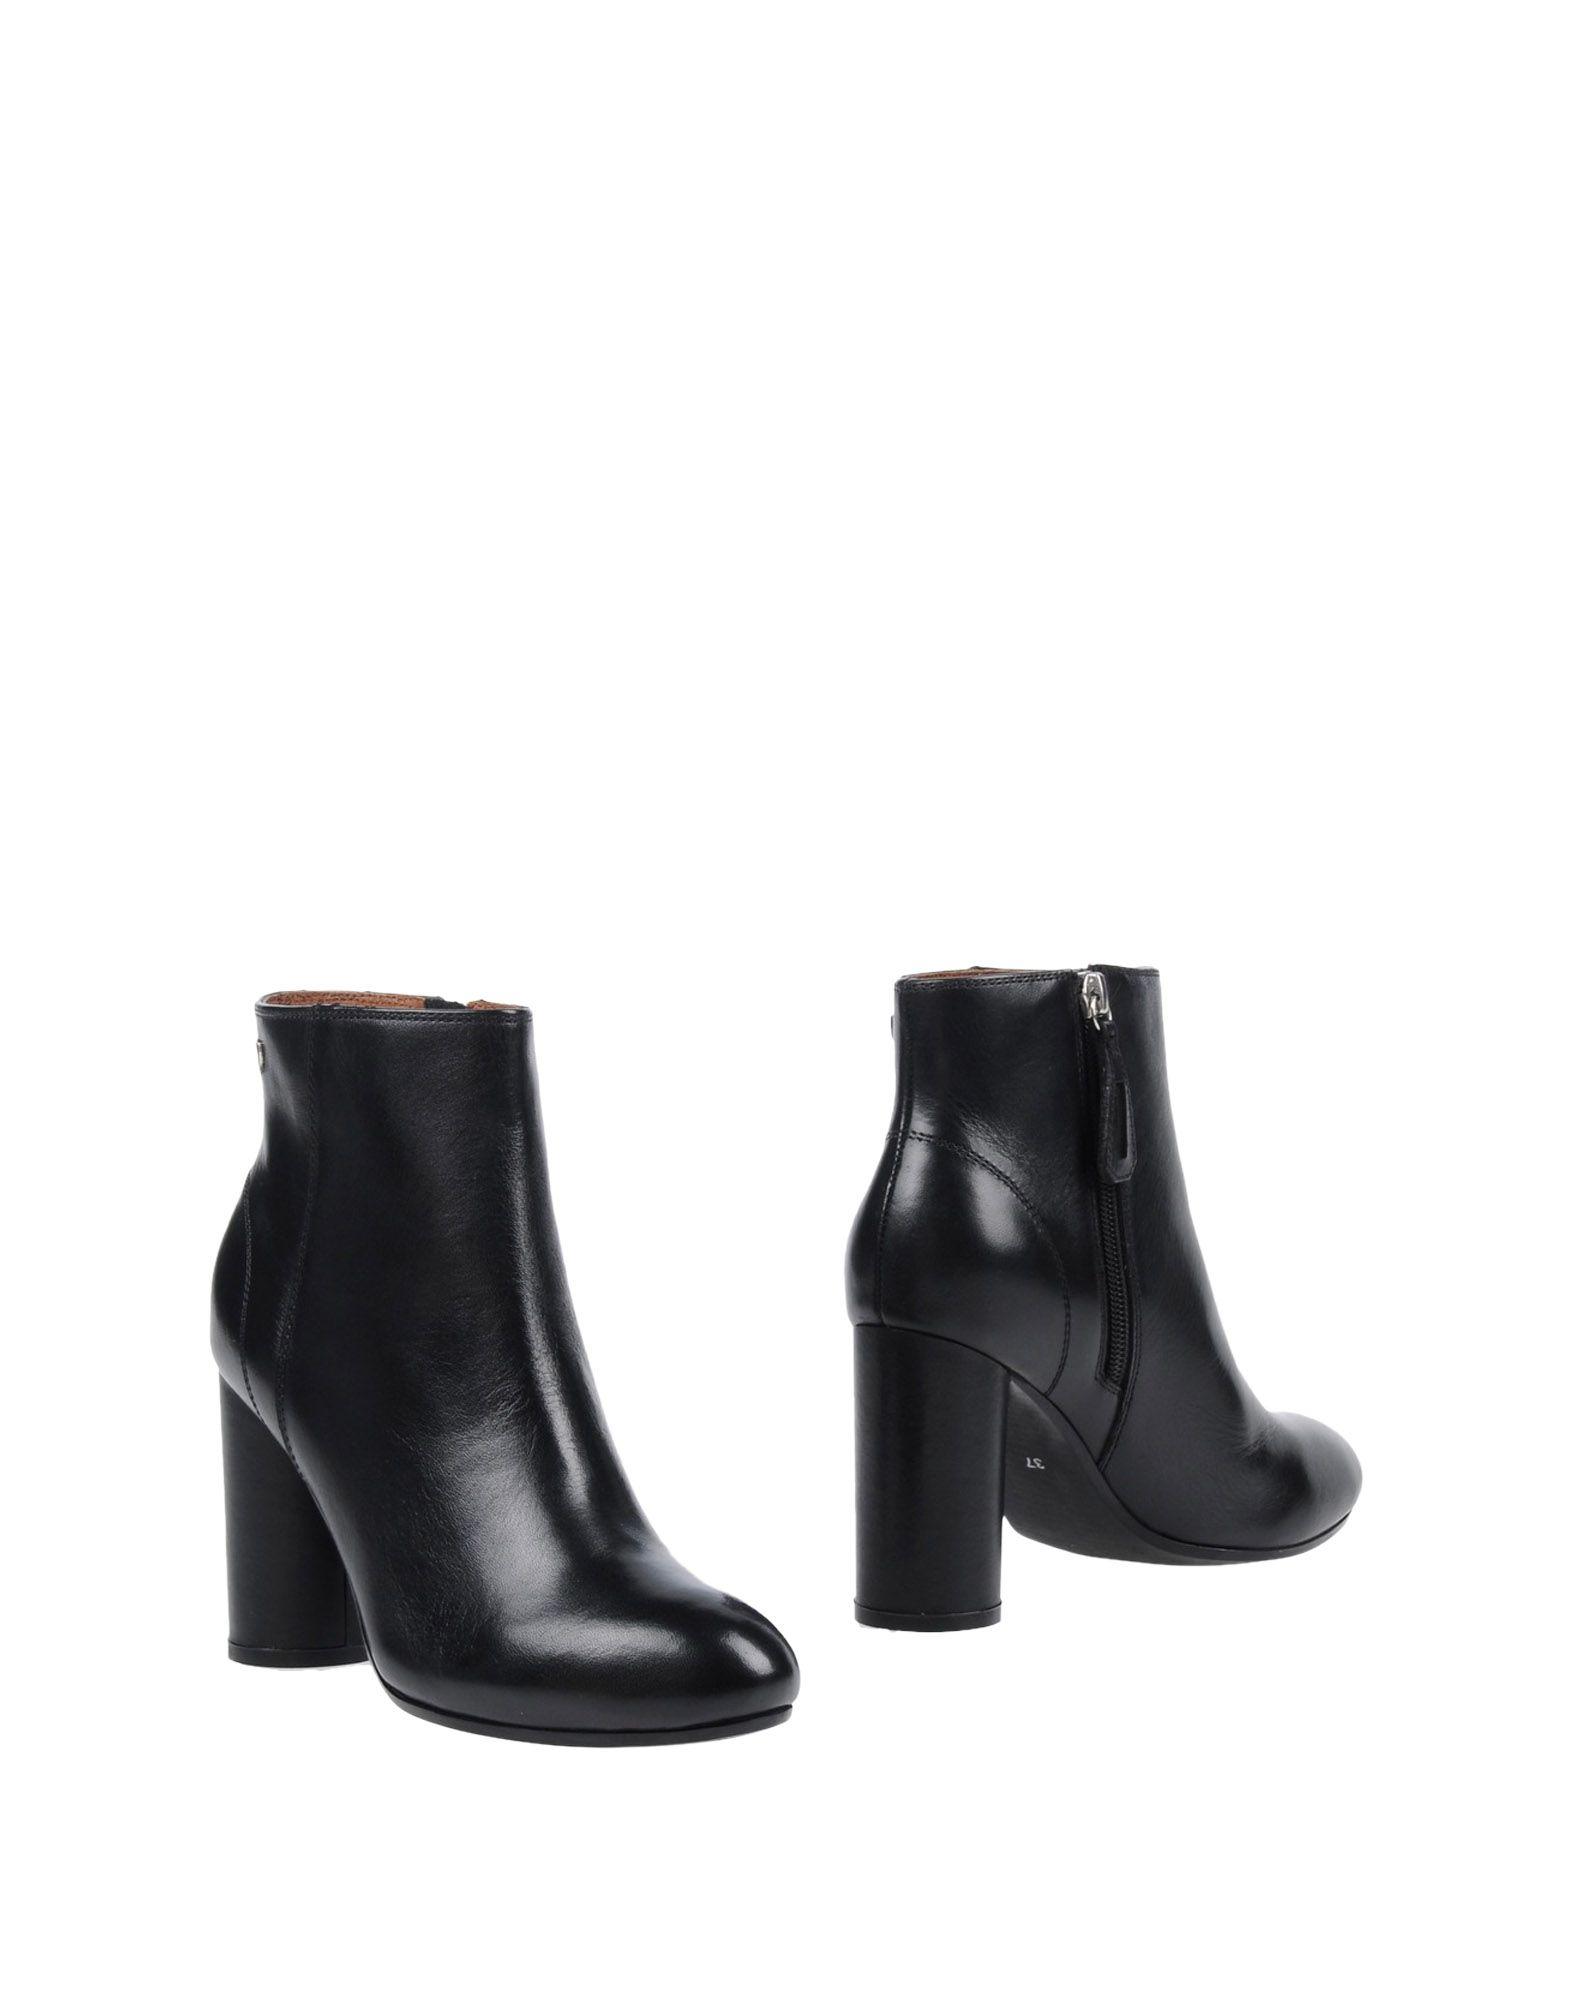 Gioseppo Stiefelette Damen beliebte  11461223US Gute Qualität beliebte Damen Schuhe d1fad3